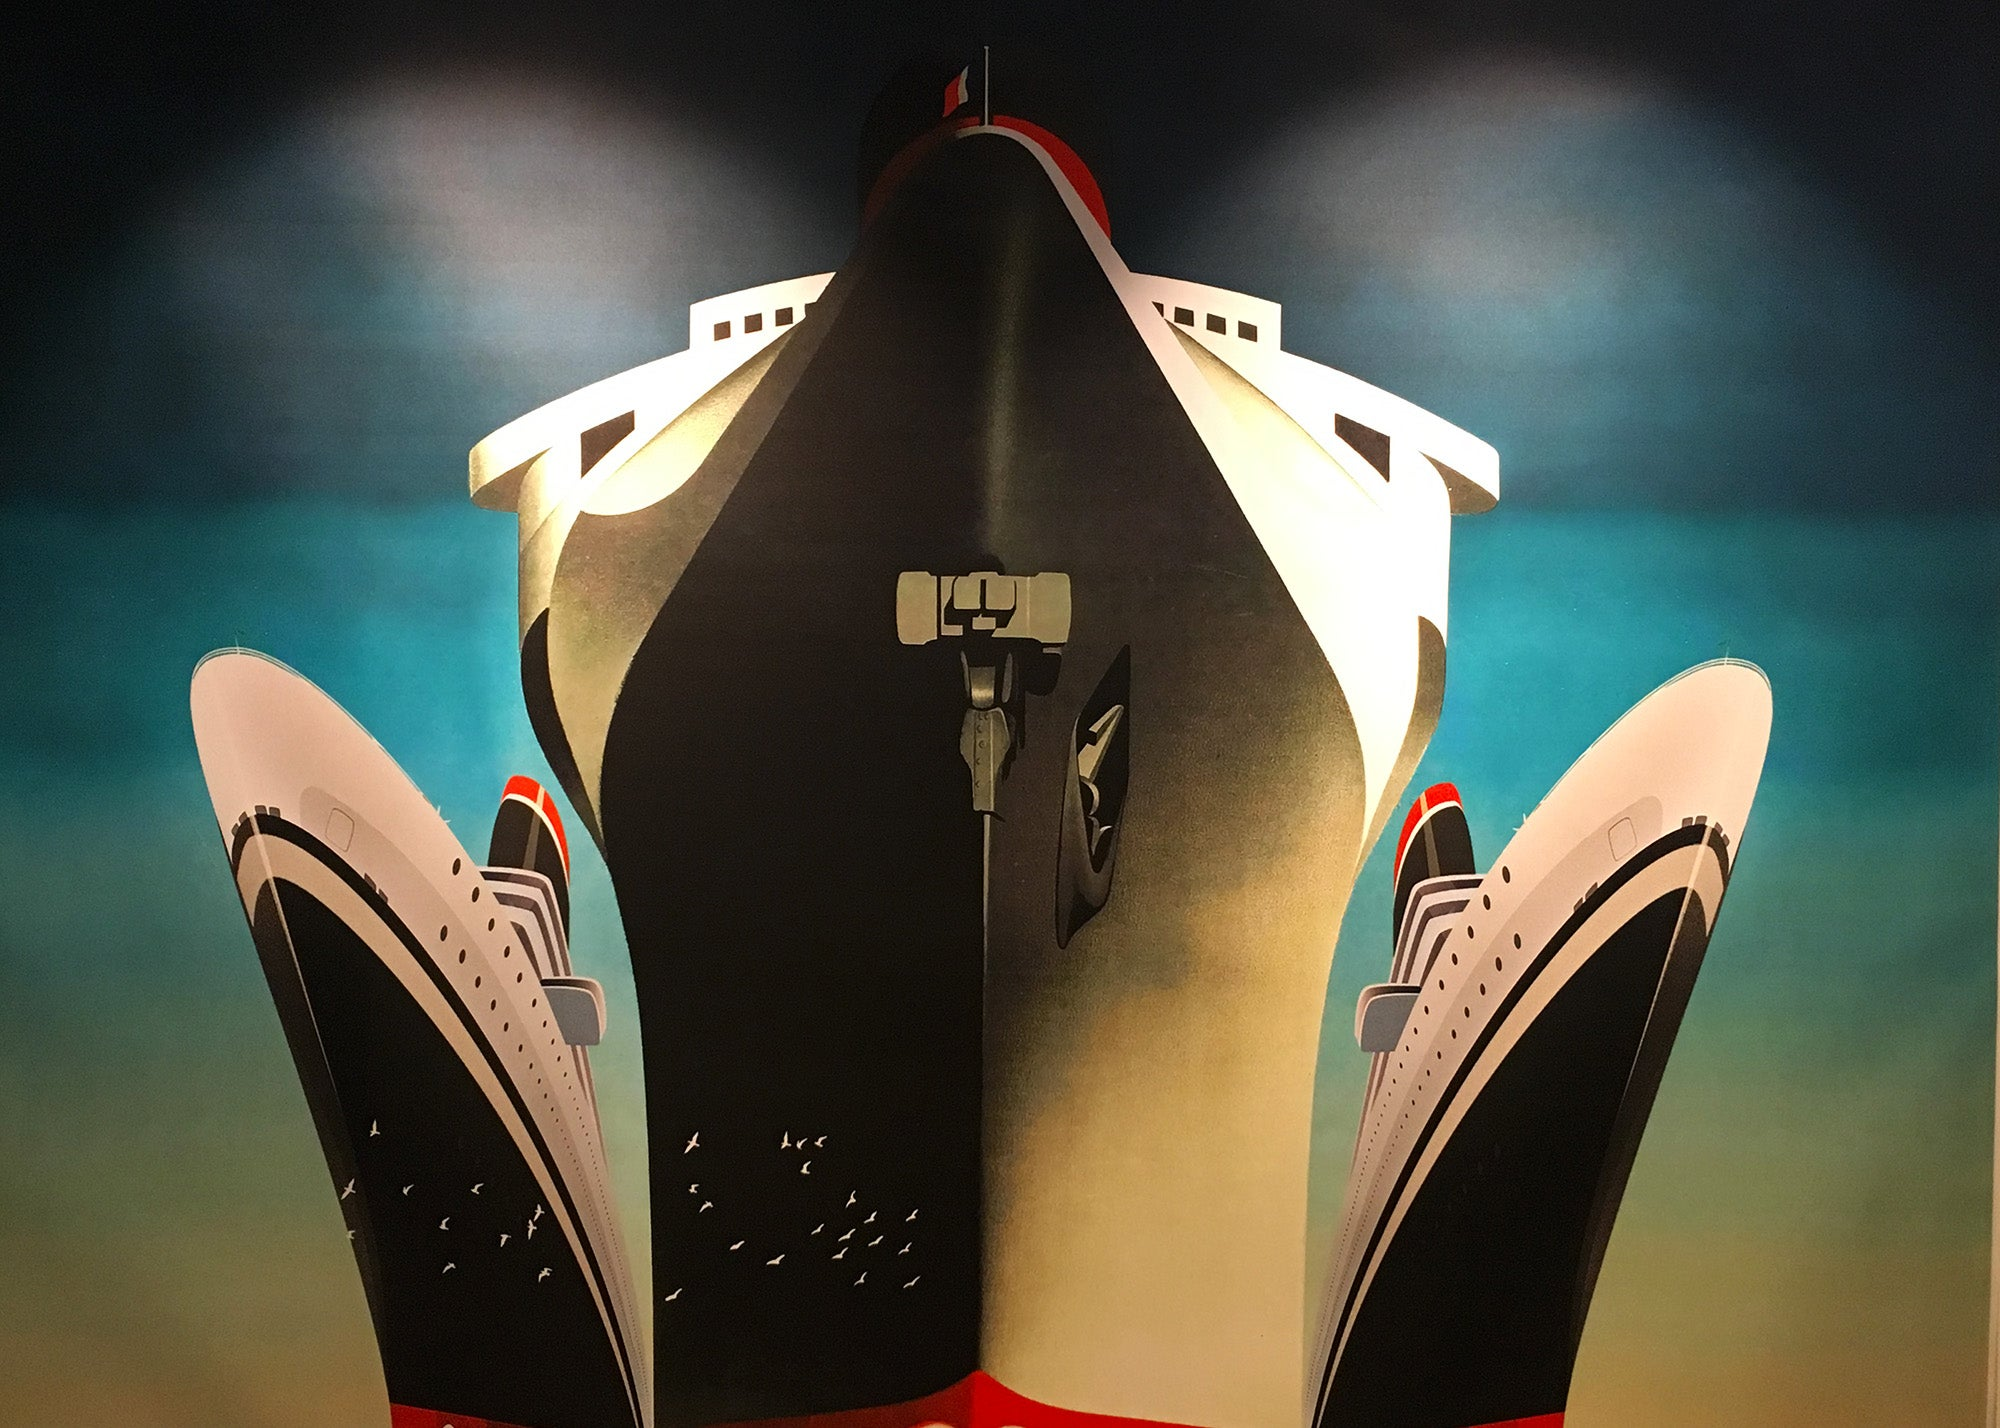 Custom artwork at The Oyster Club